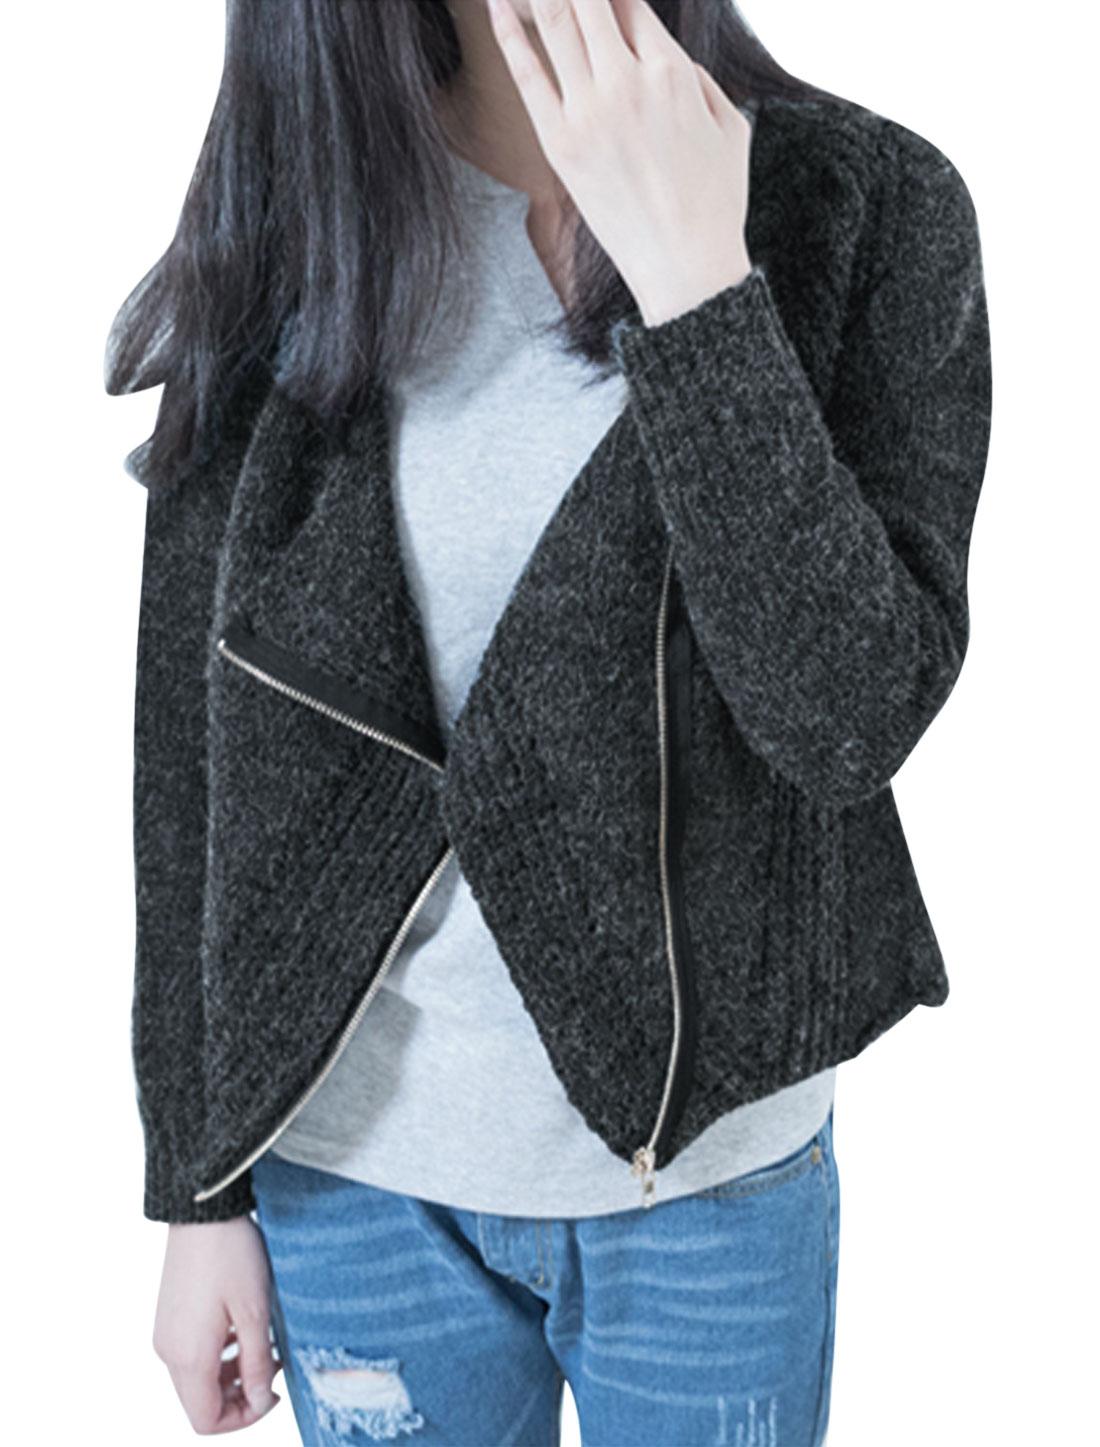 Women Convertible Collar Raglan Sleeves Trendy Knitted Cardigan Dark Gray M